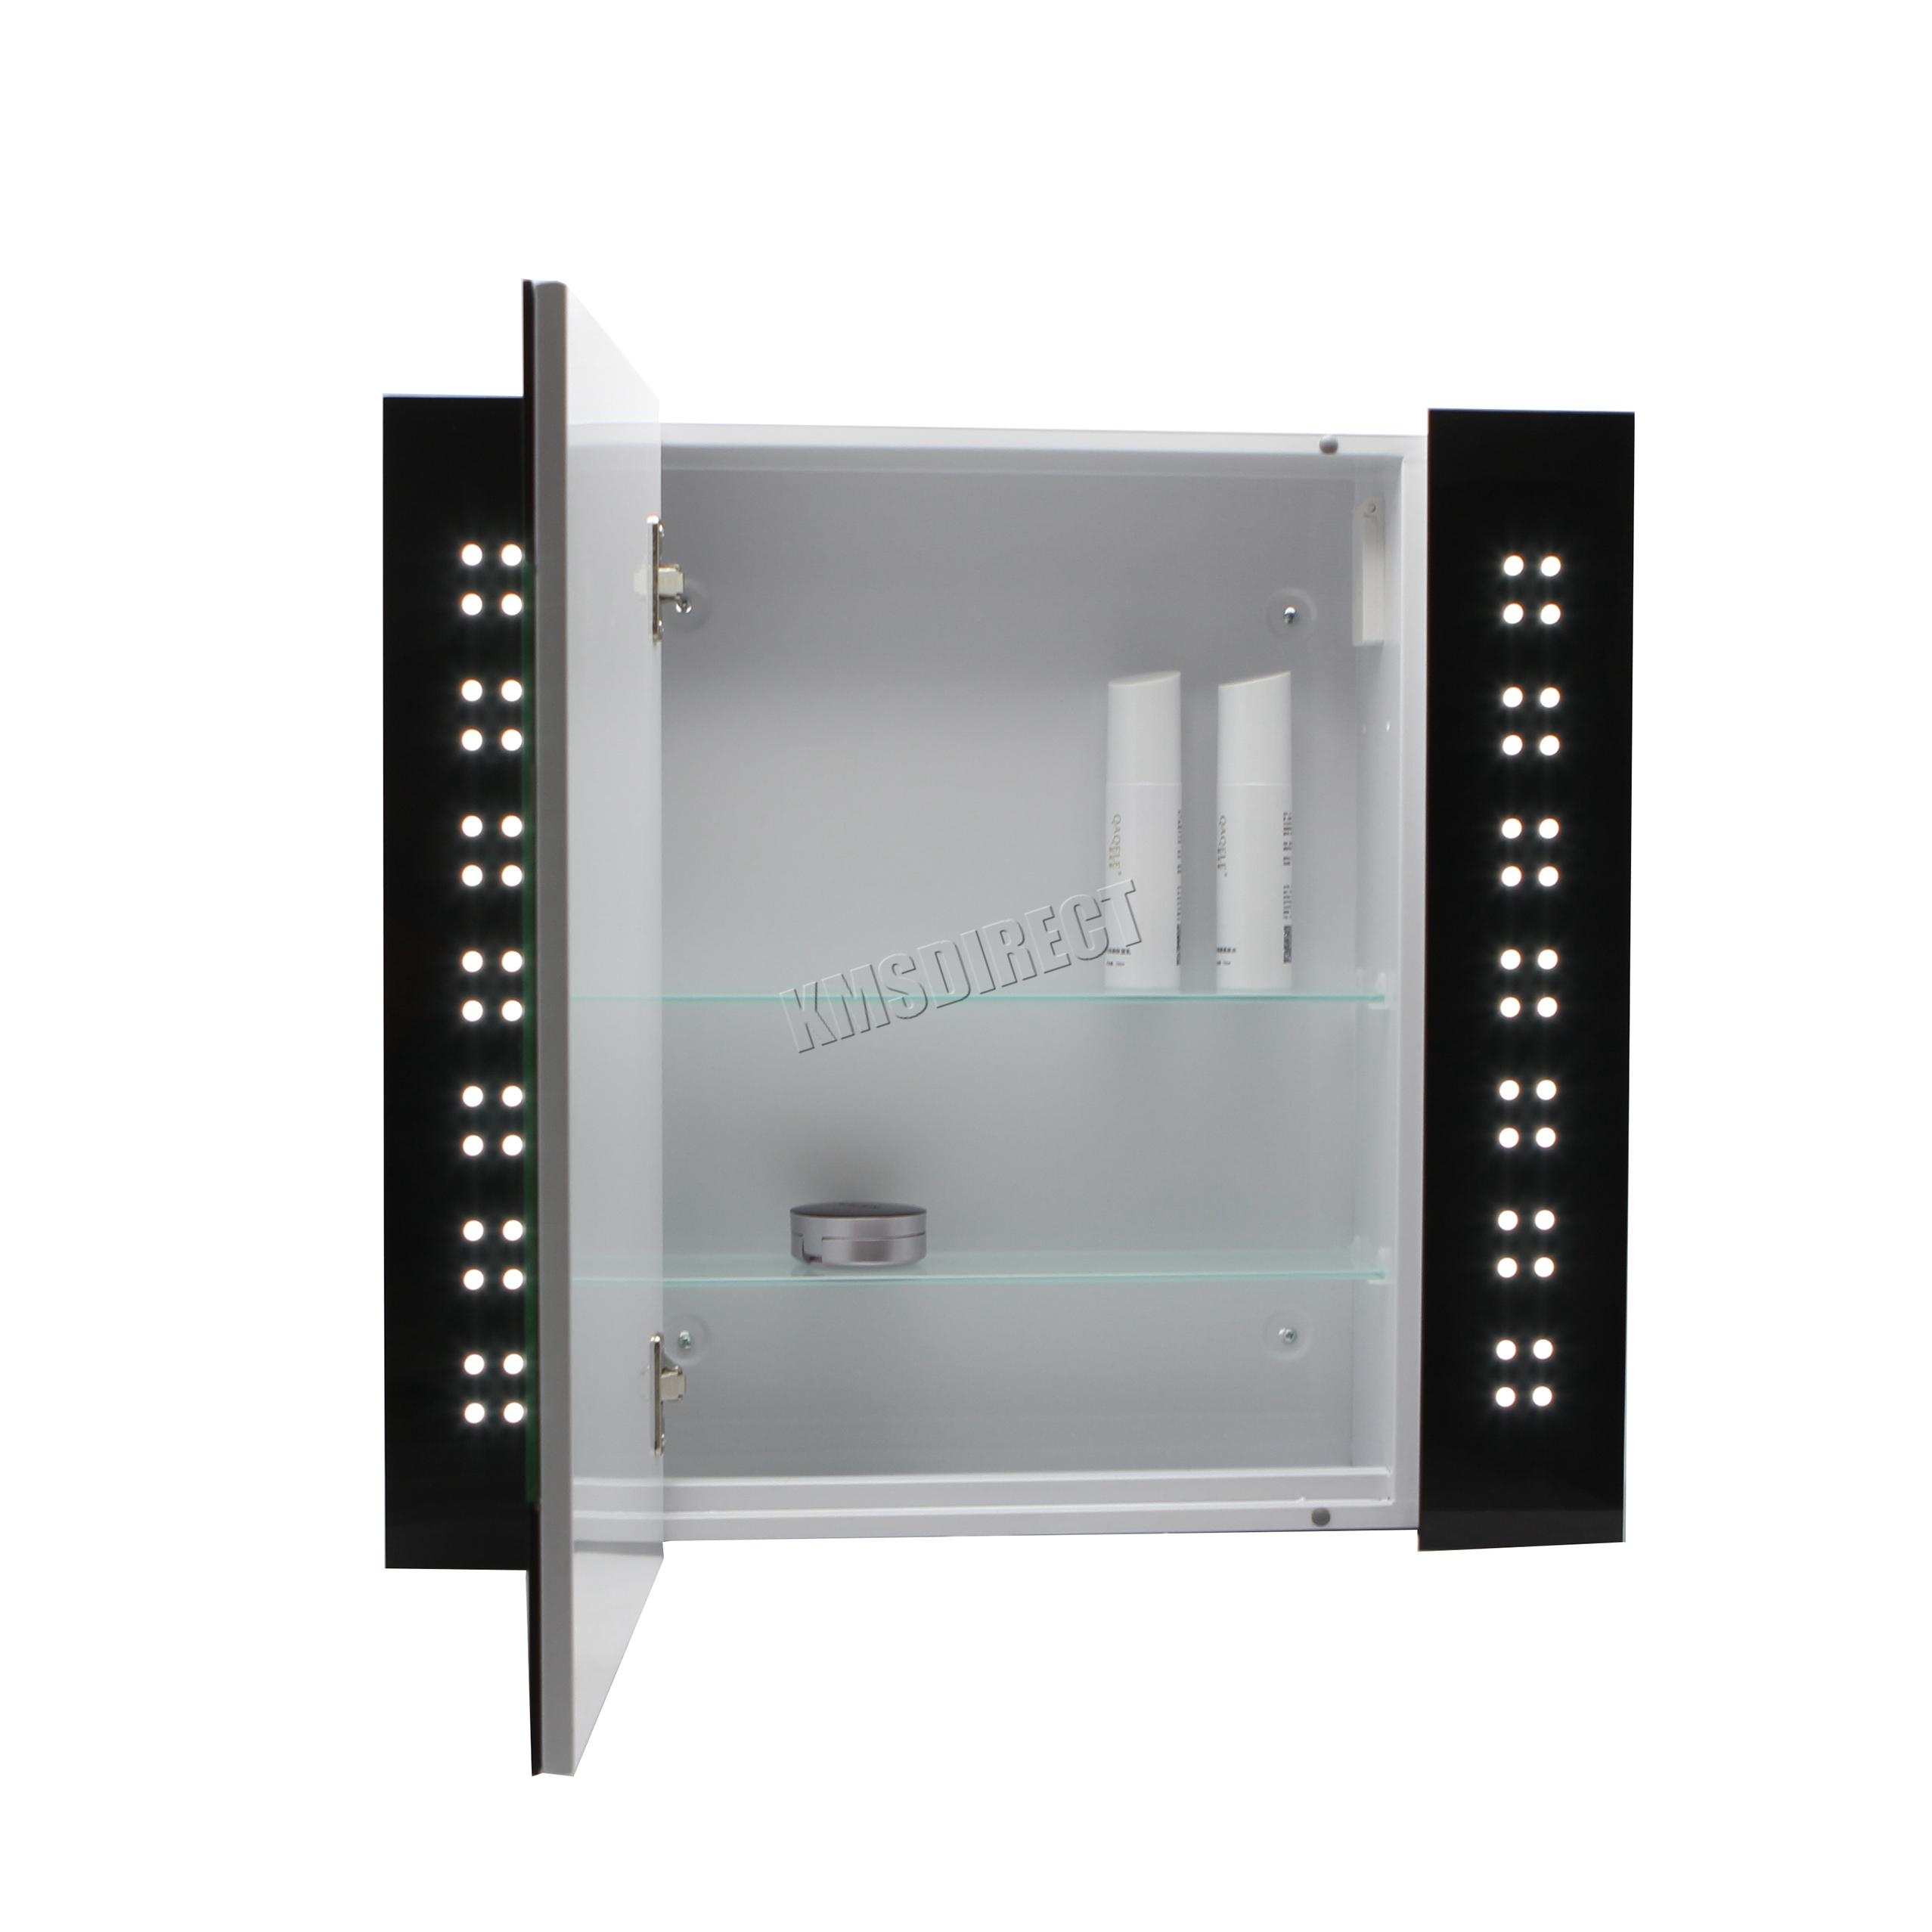 Foxhunter LED beleuchtet Spiegel Badezimmer Schrank Stahl Schrank Sensor  eBay